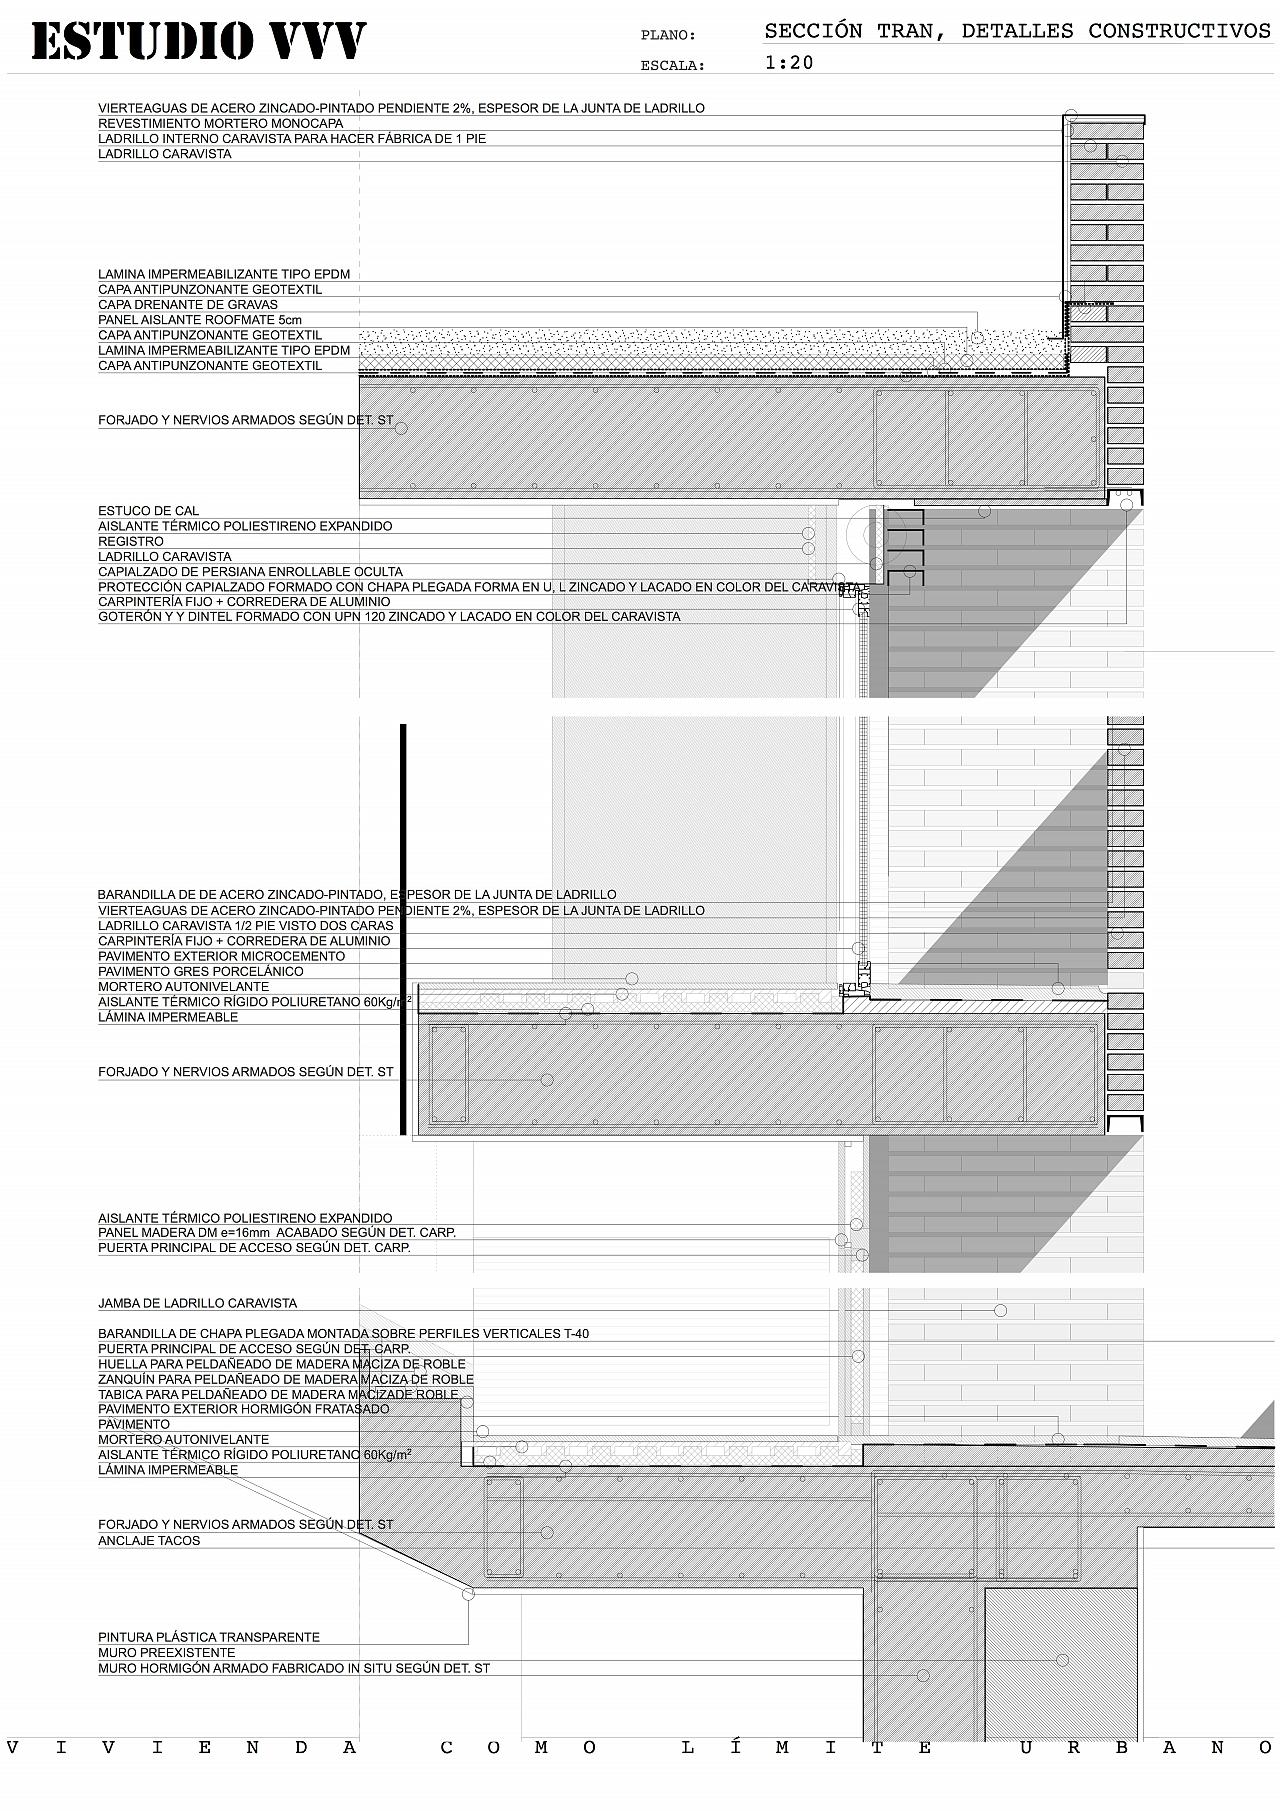 Vida del proyecto vivienda como l mite urbano - Detalle carpinteria aluminio ...